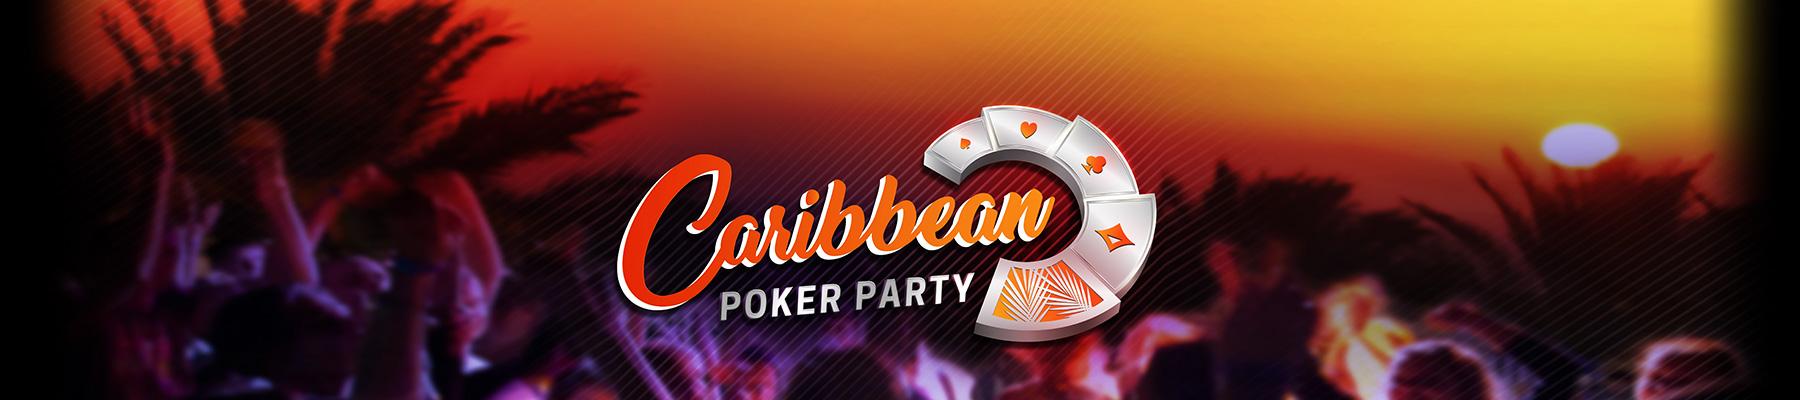 Caribbean Poker Party Festival - $10,000,000 Gtd